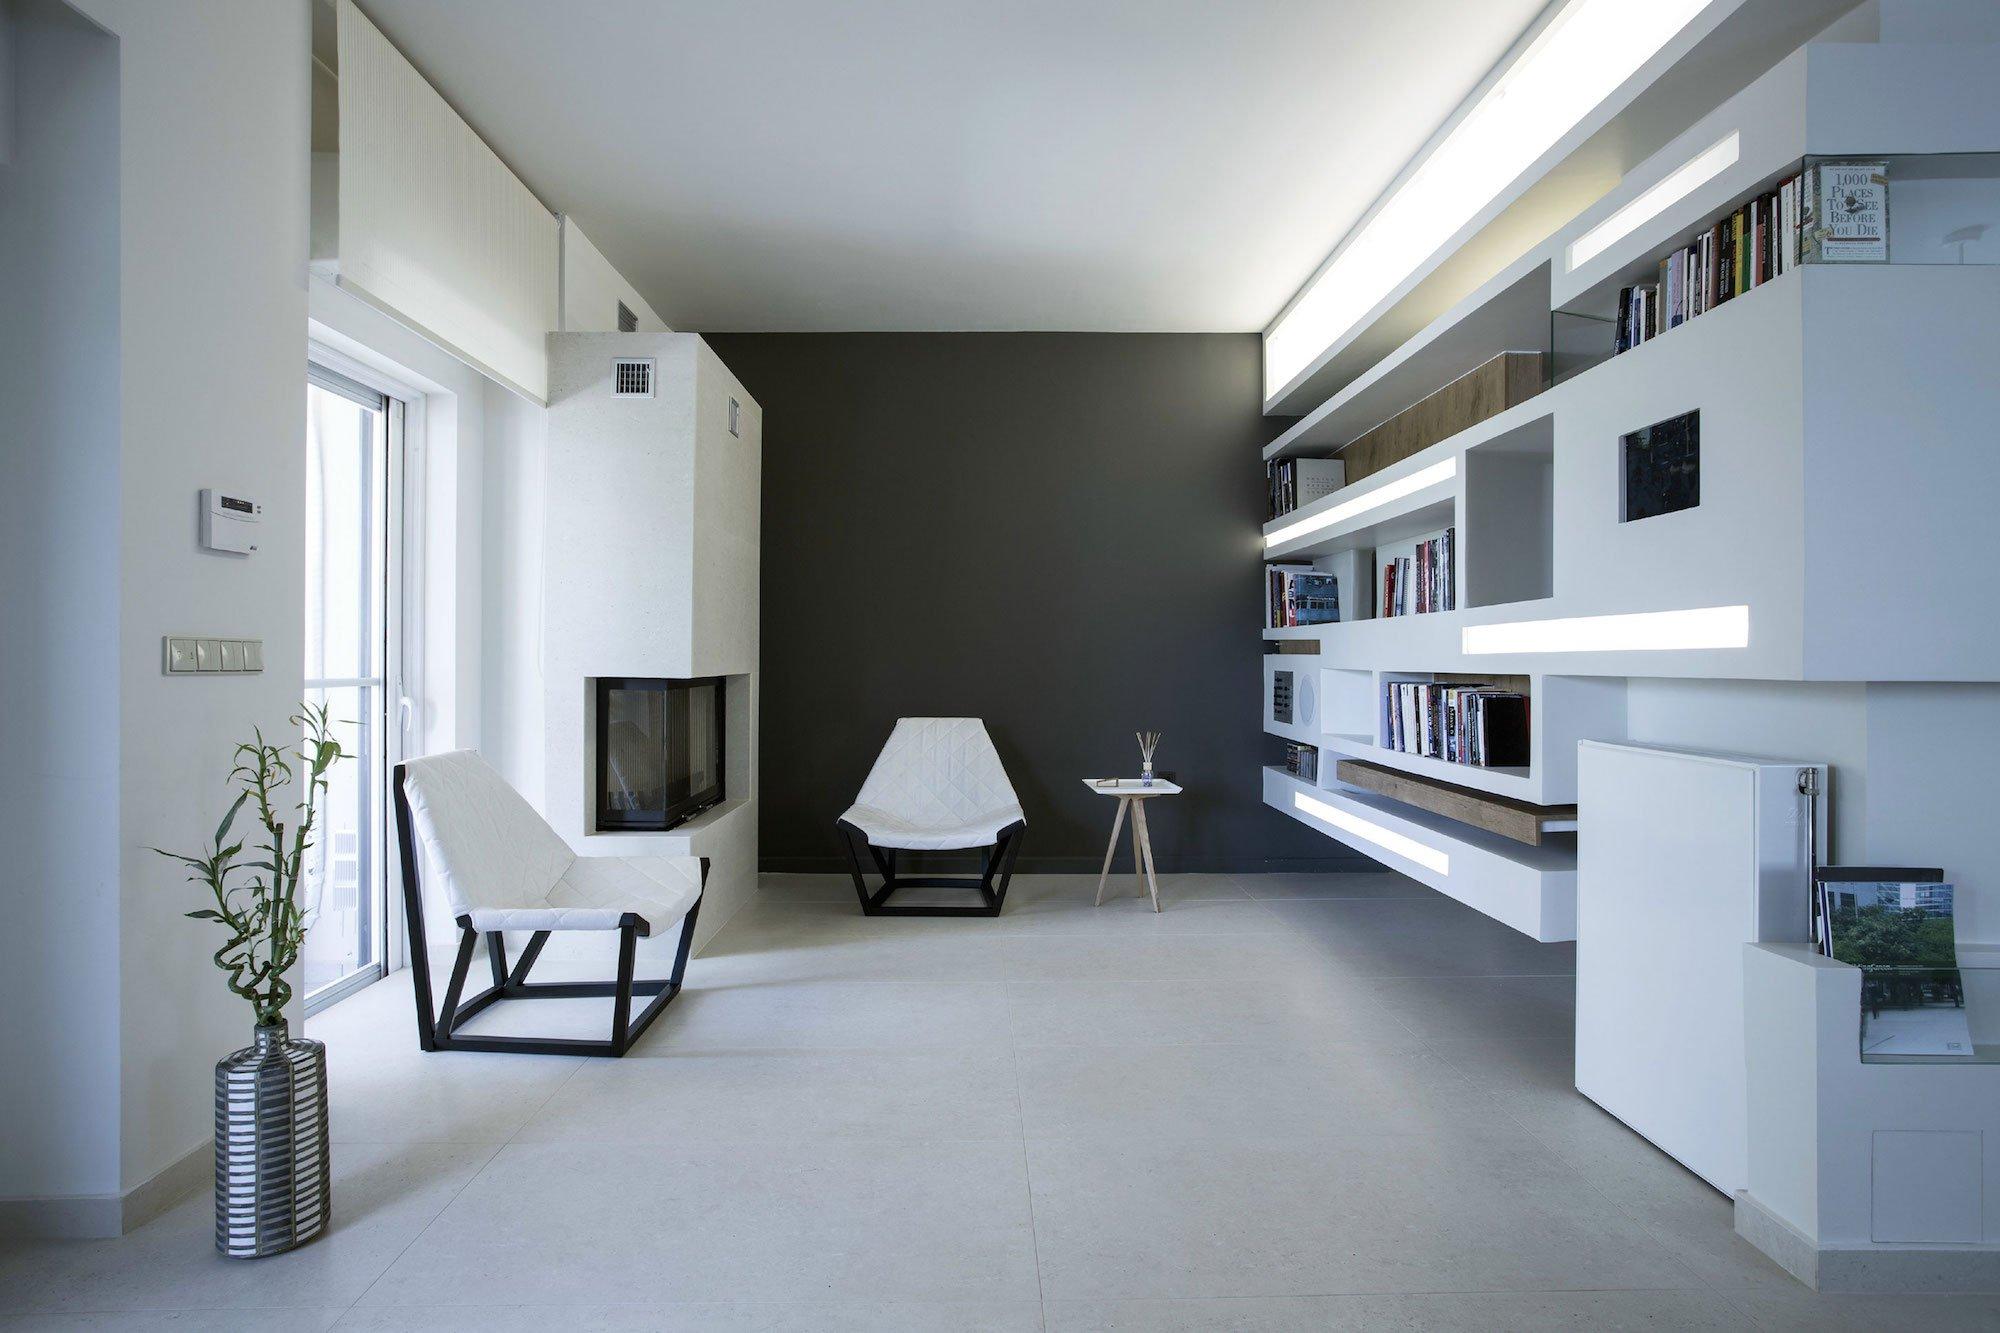 Erosion By Studio NL Architecture And Design